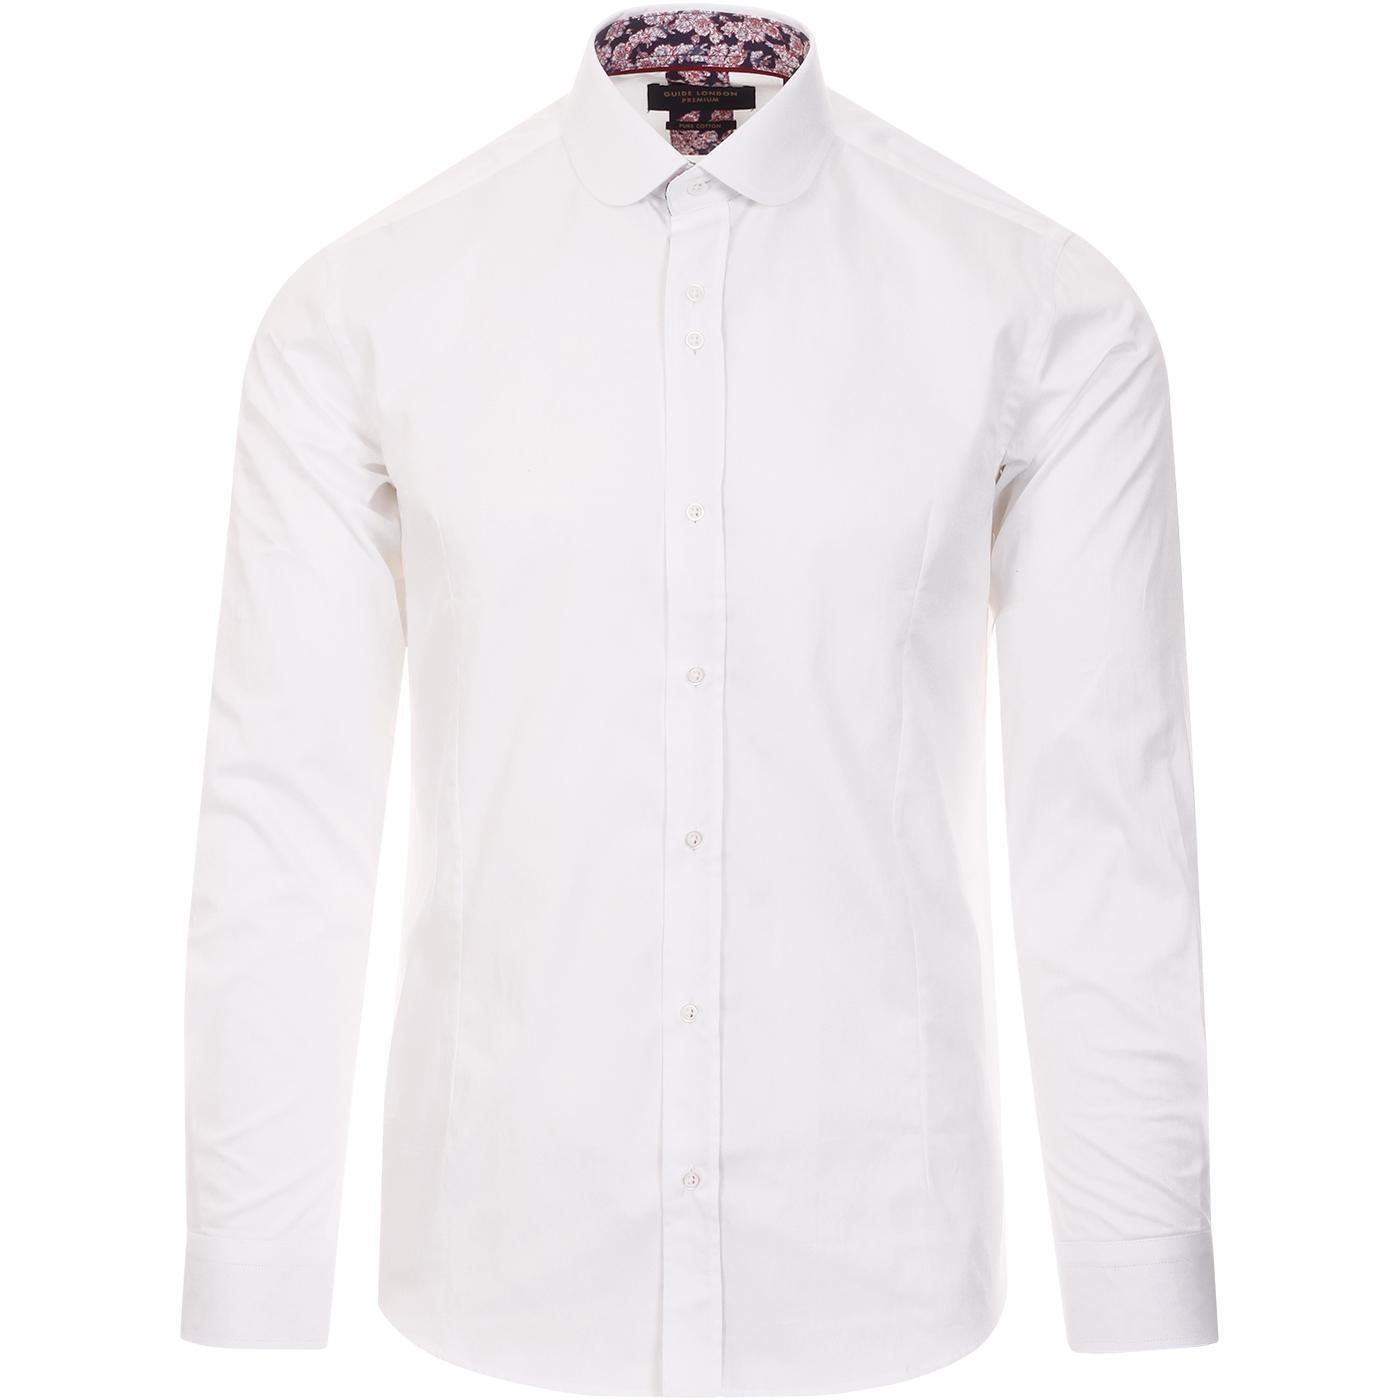 GUIDE LONDON 1960s Mod Round Collar Shirt (White)